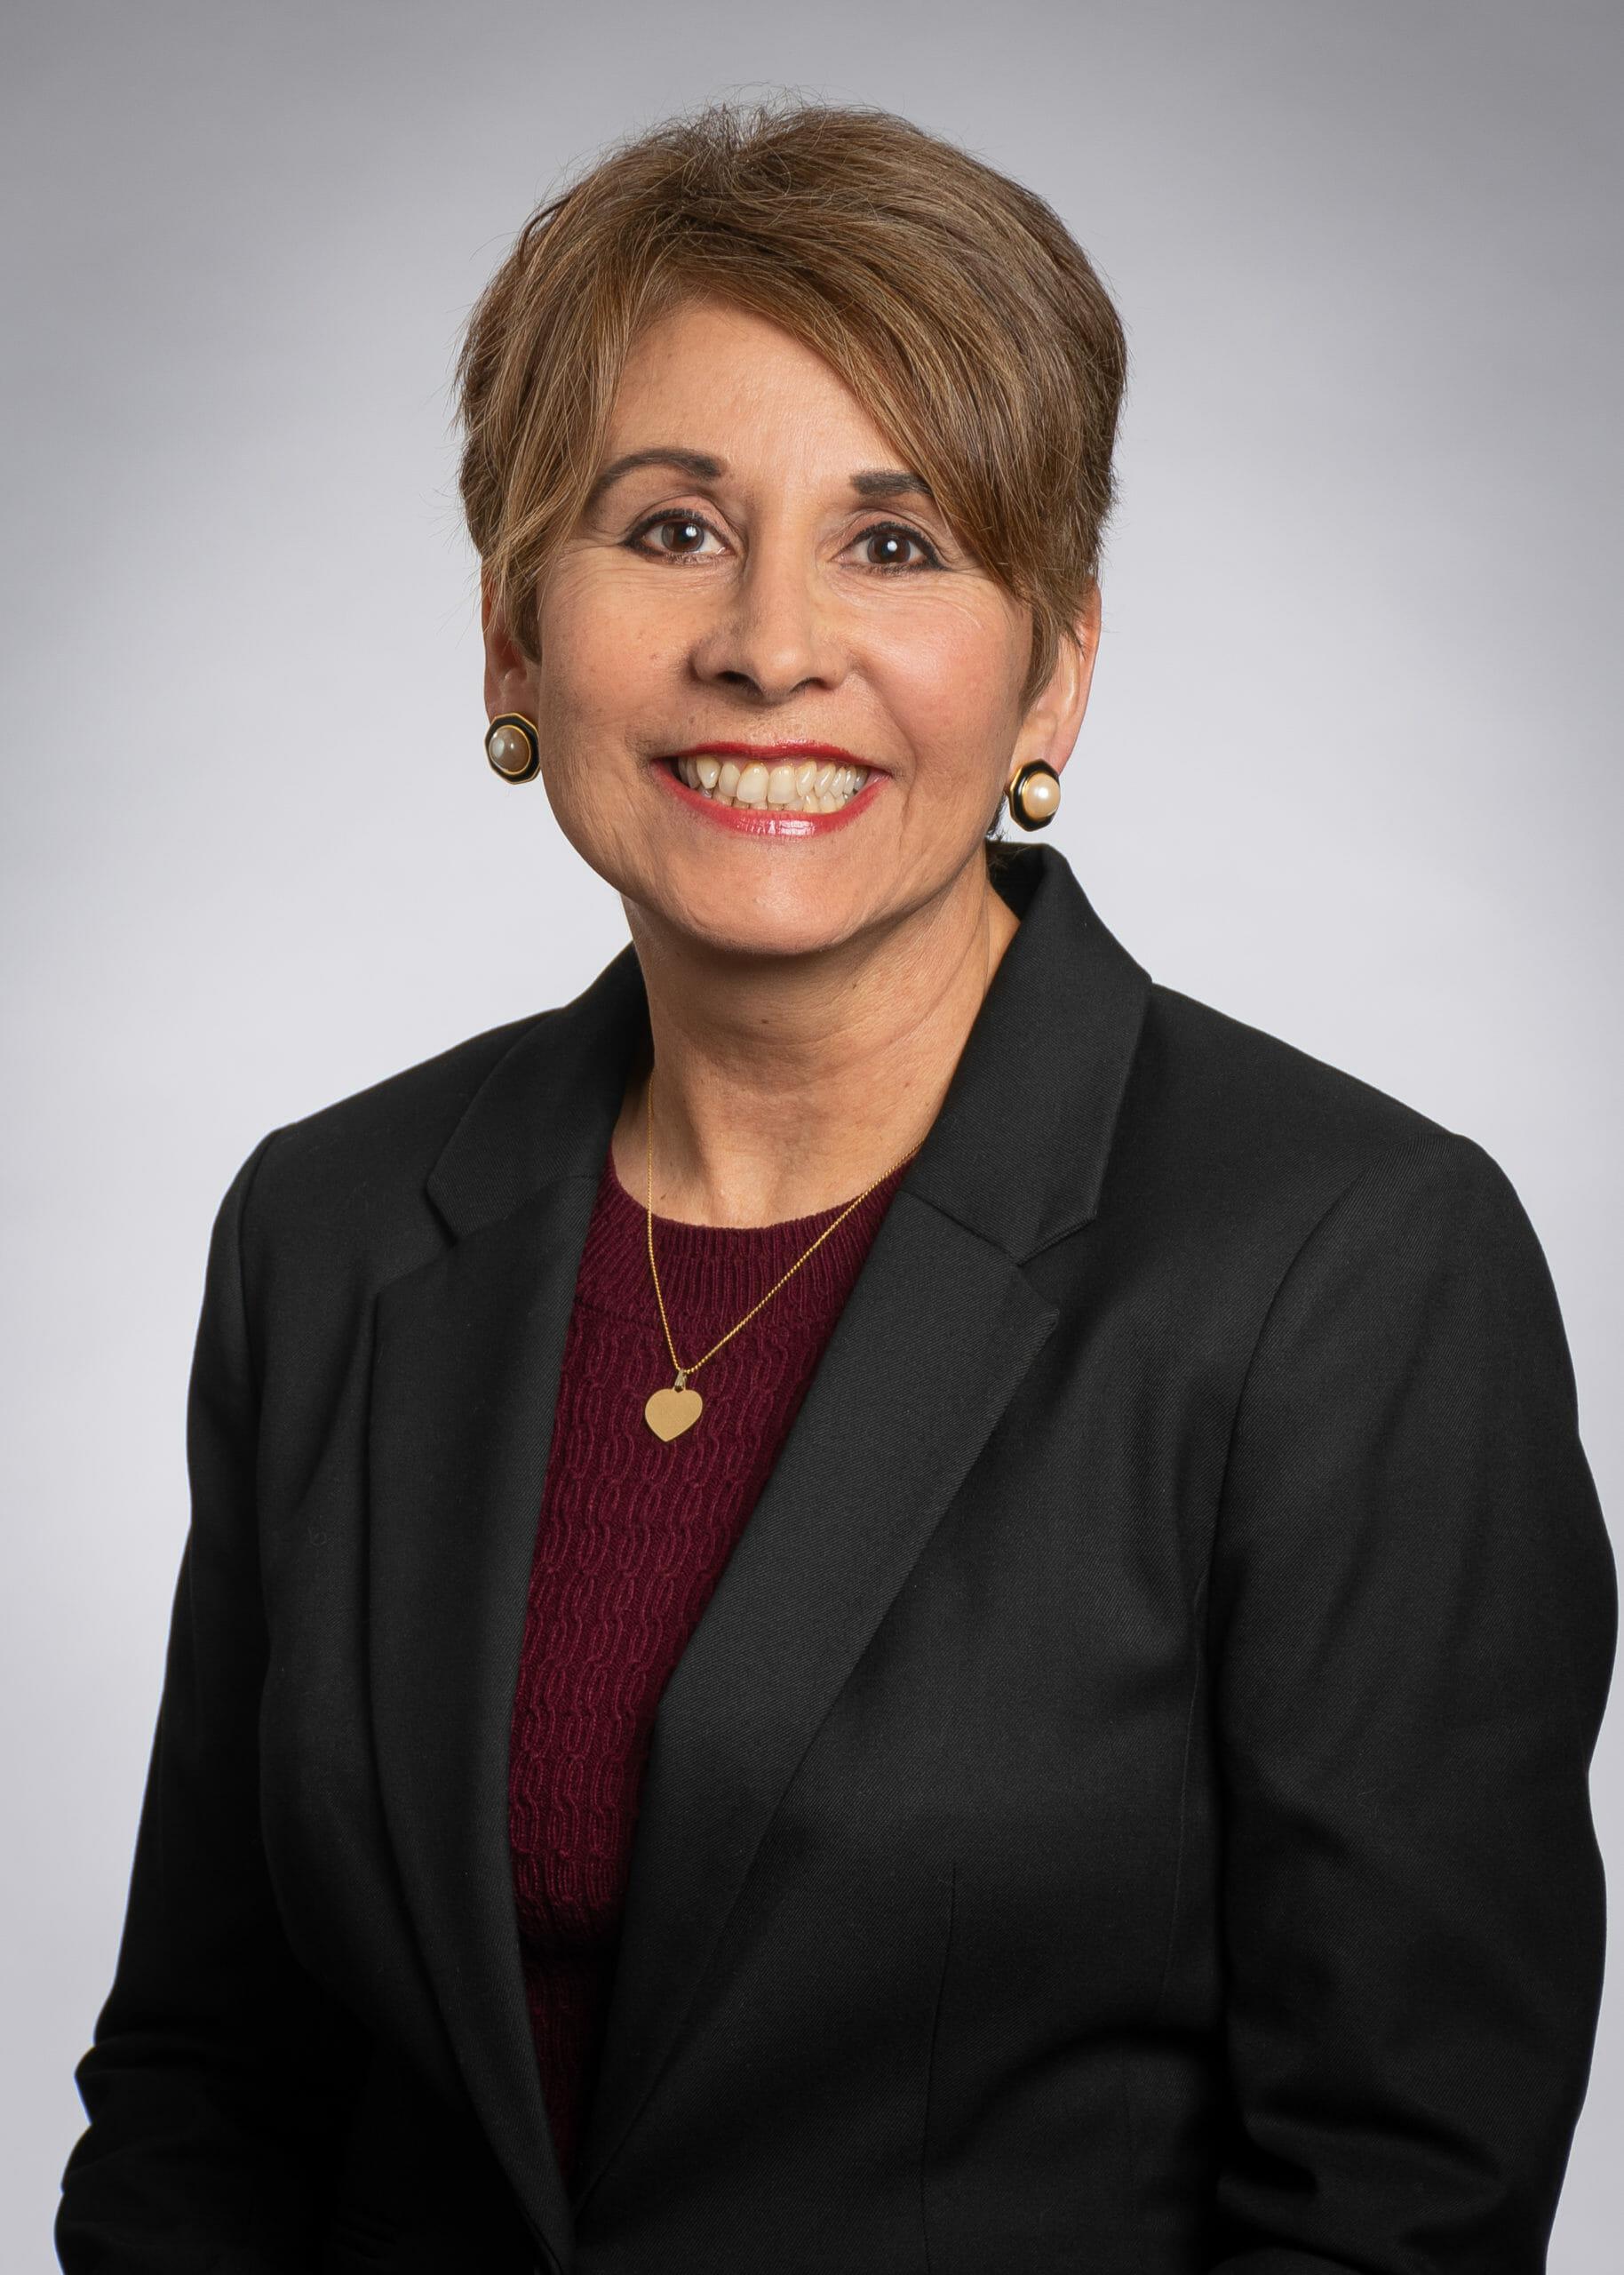 Headshot of Cynthia Vermillion